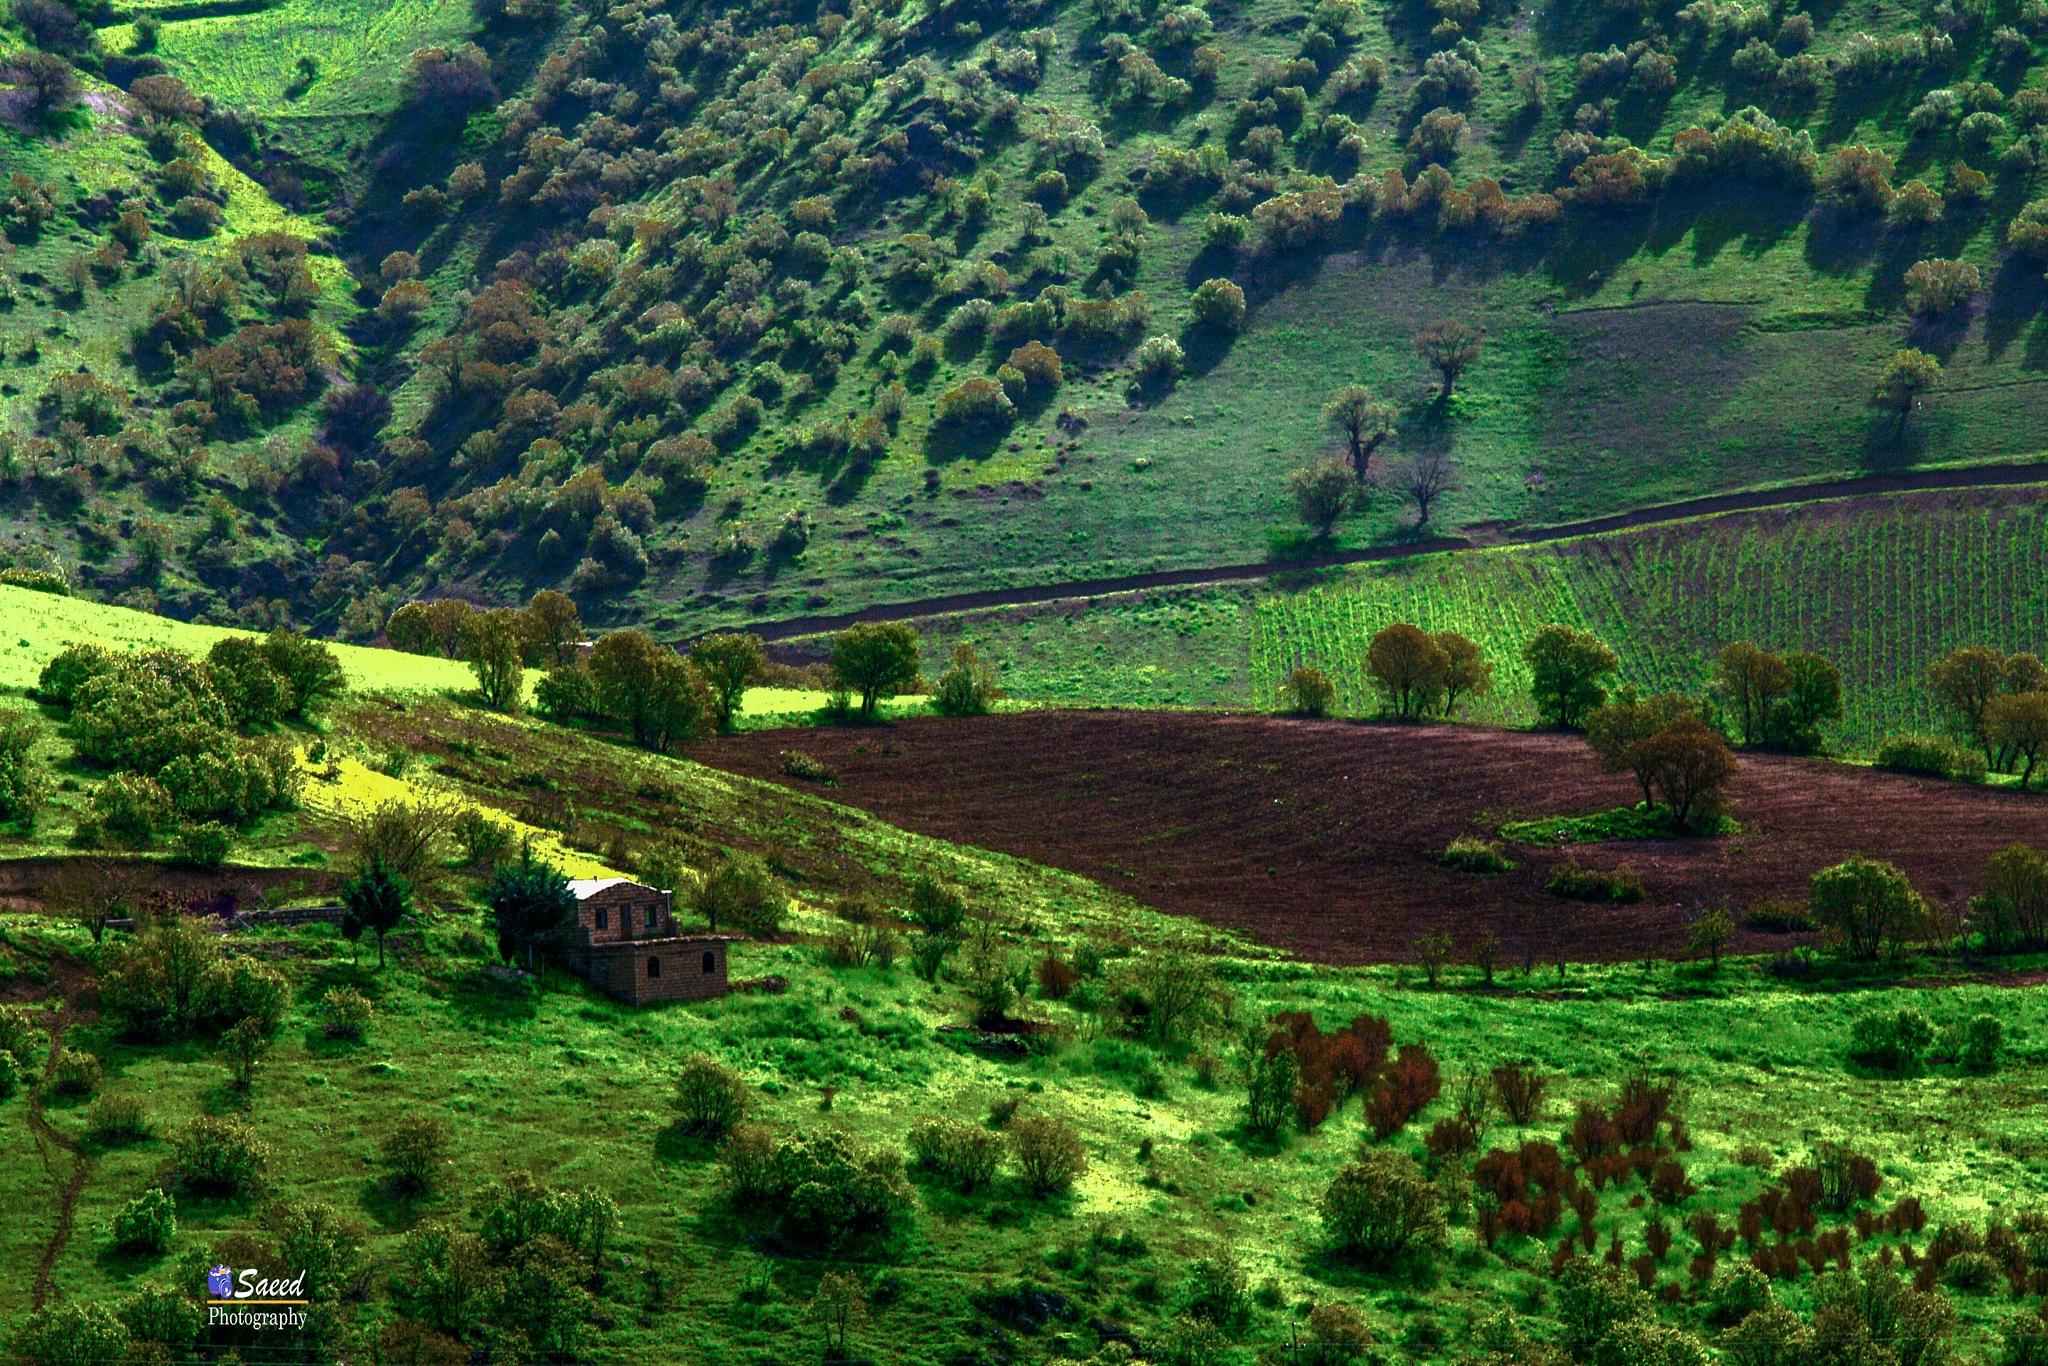 green by Saeed Khansarian